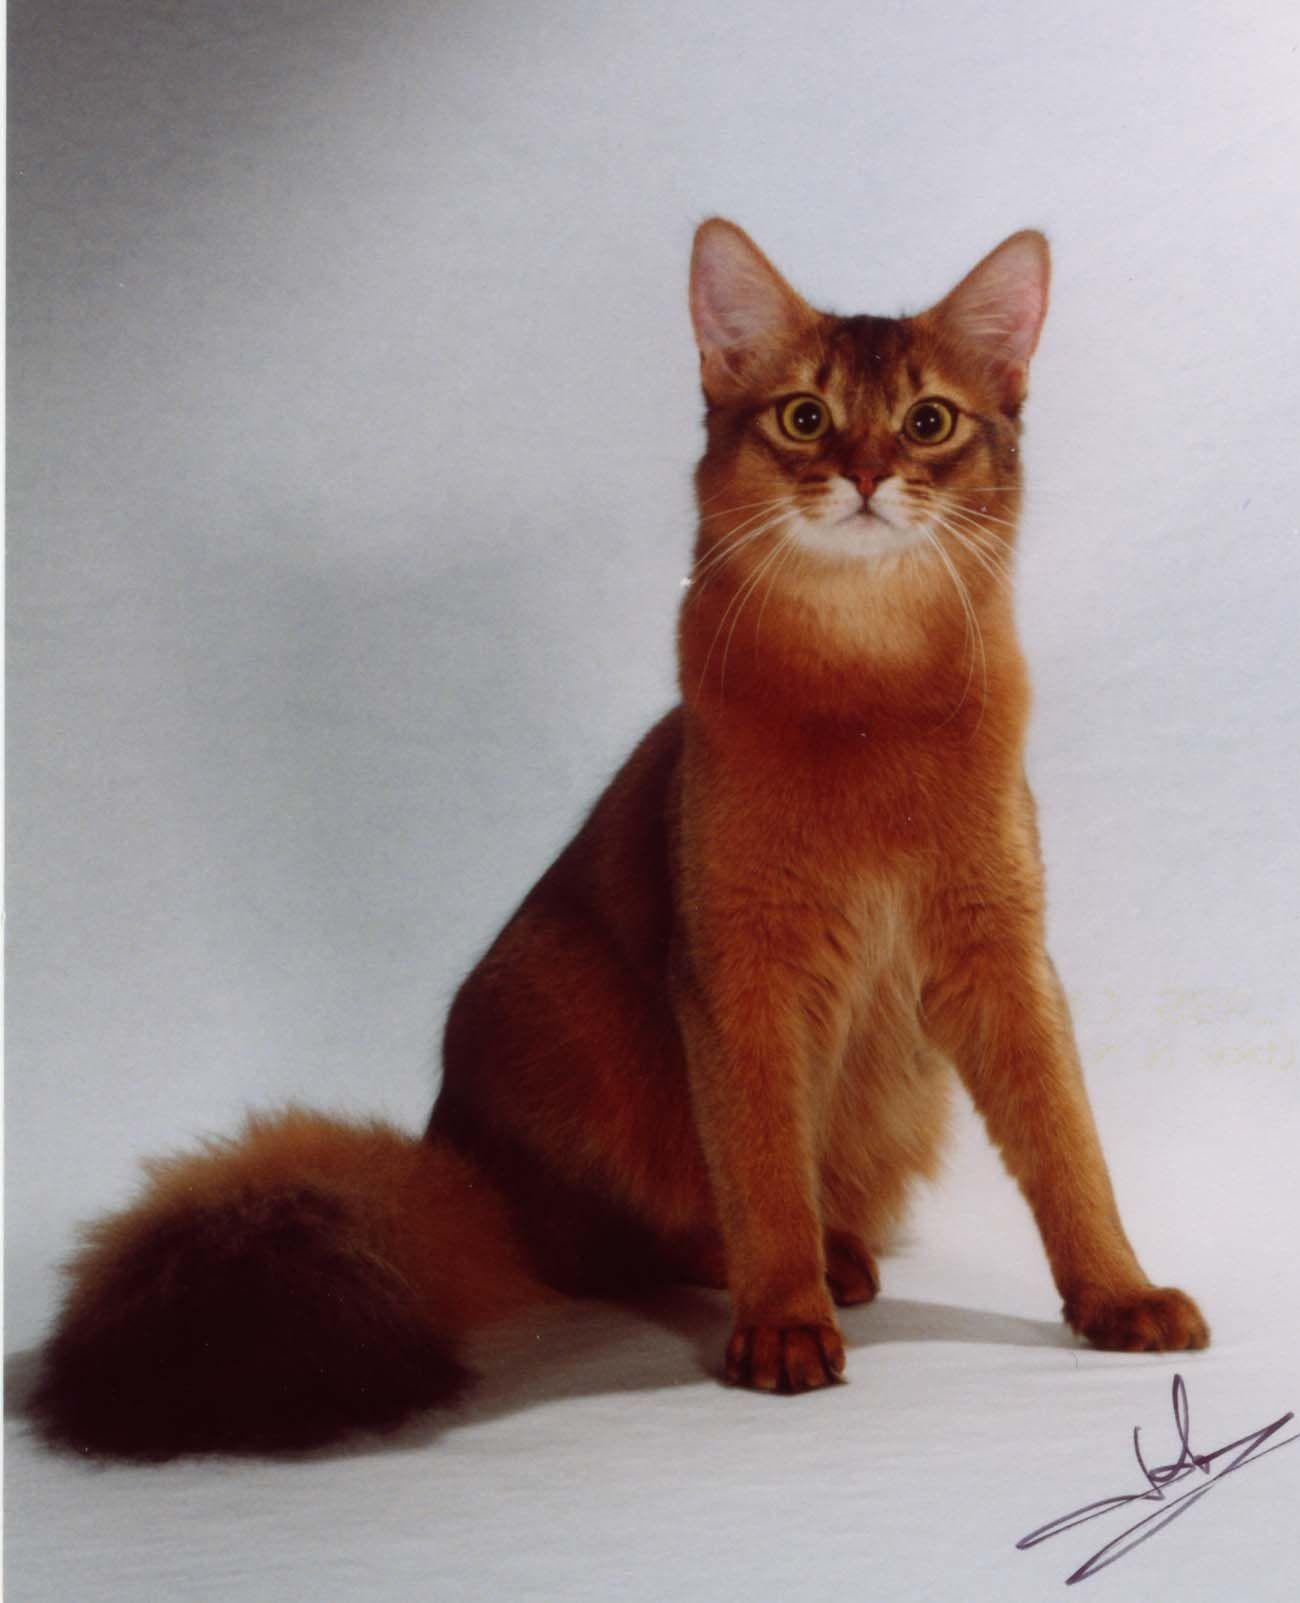 ruddy somali cat - Google Search | Animals | Pinterest ...